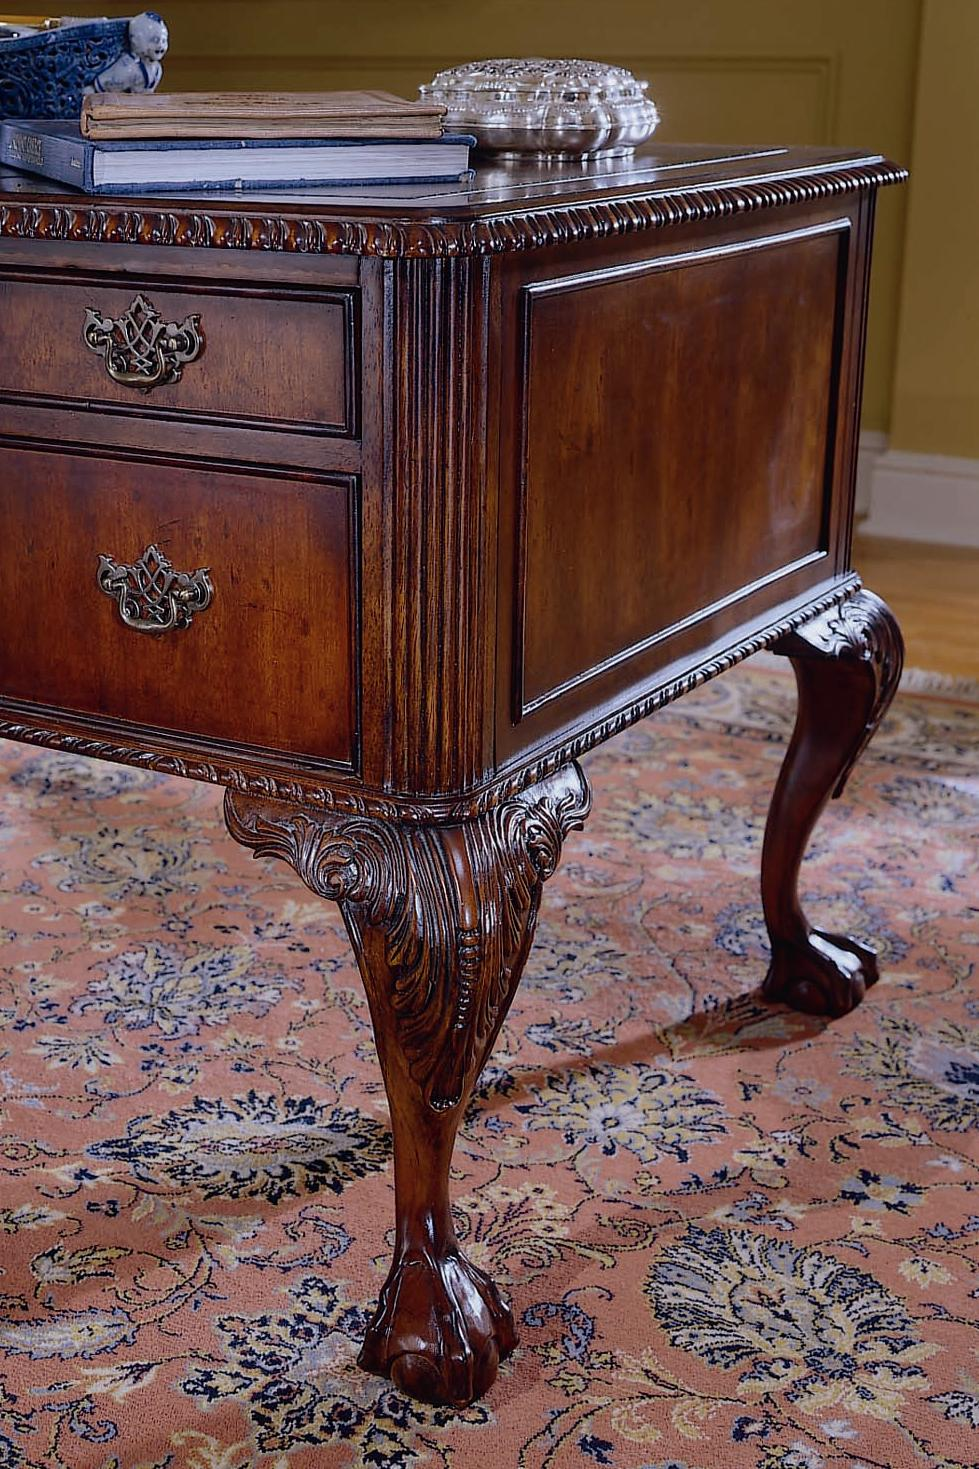 Terrific 434 434 By Hooker Furniture Esprit Decor Home Machost Co Dining Chair Design Ideas Machostcouk